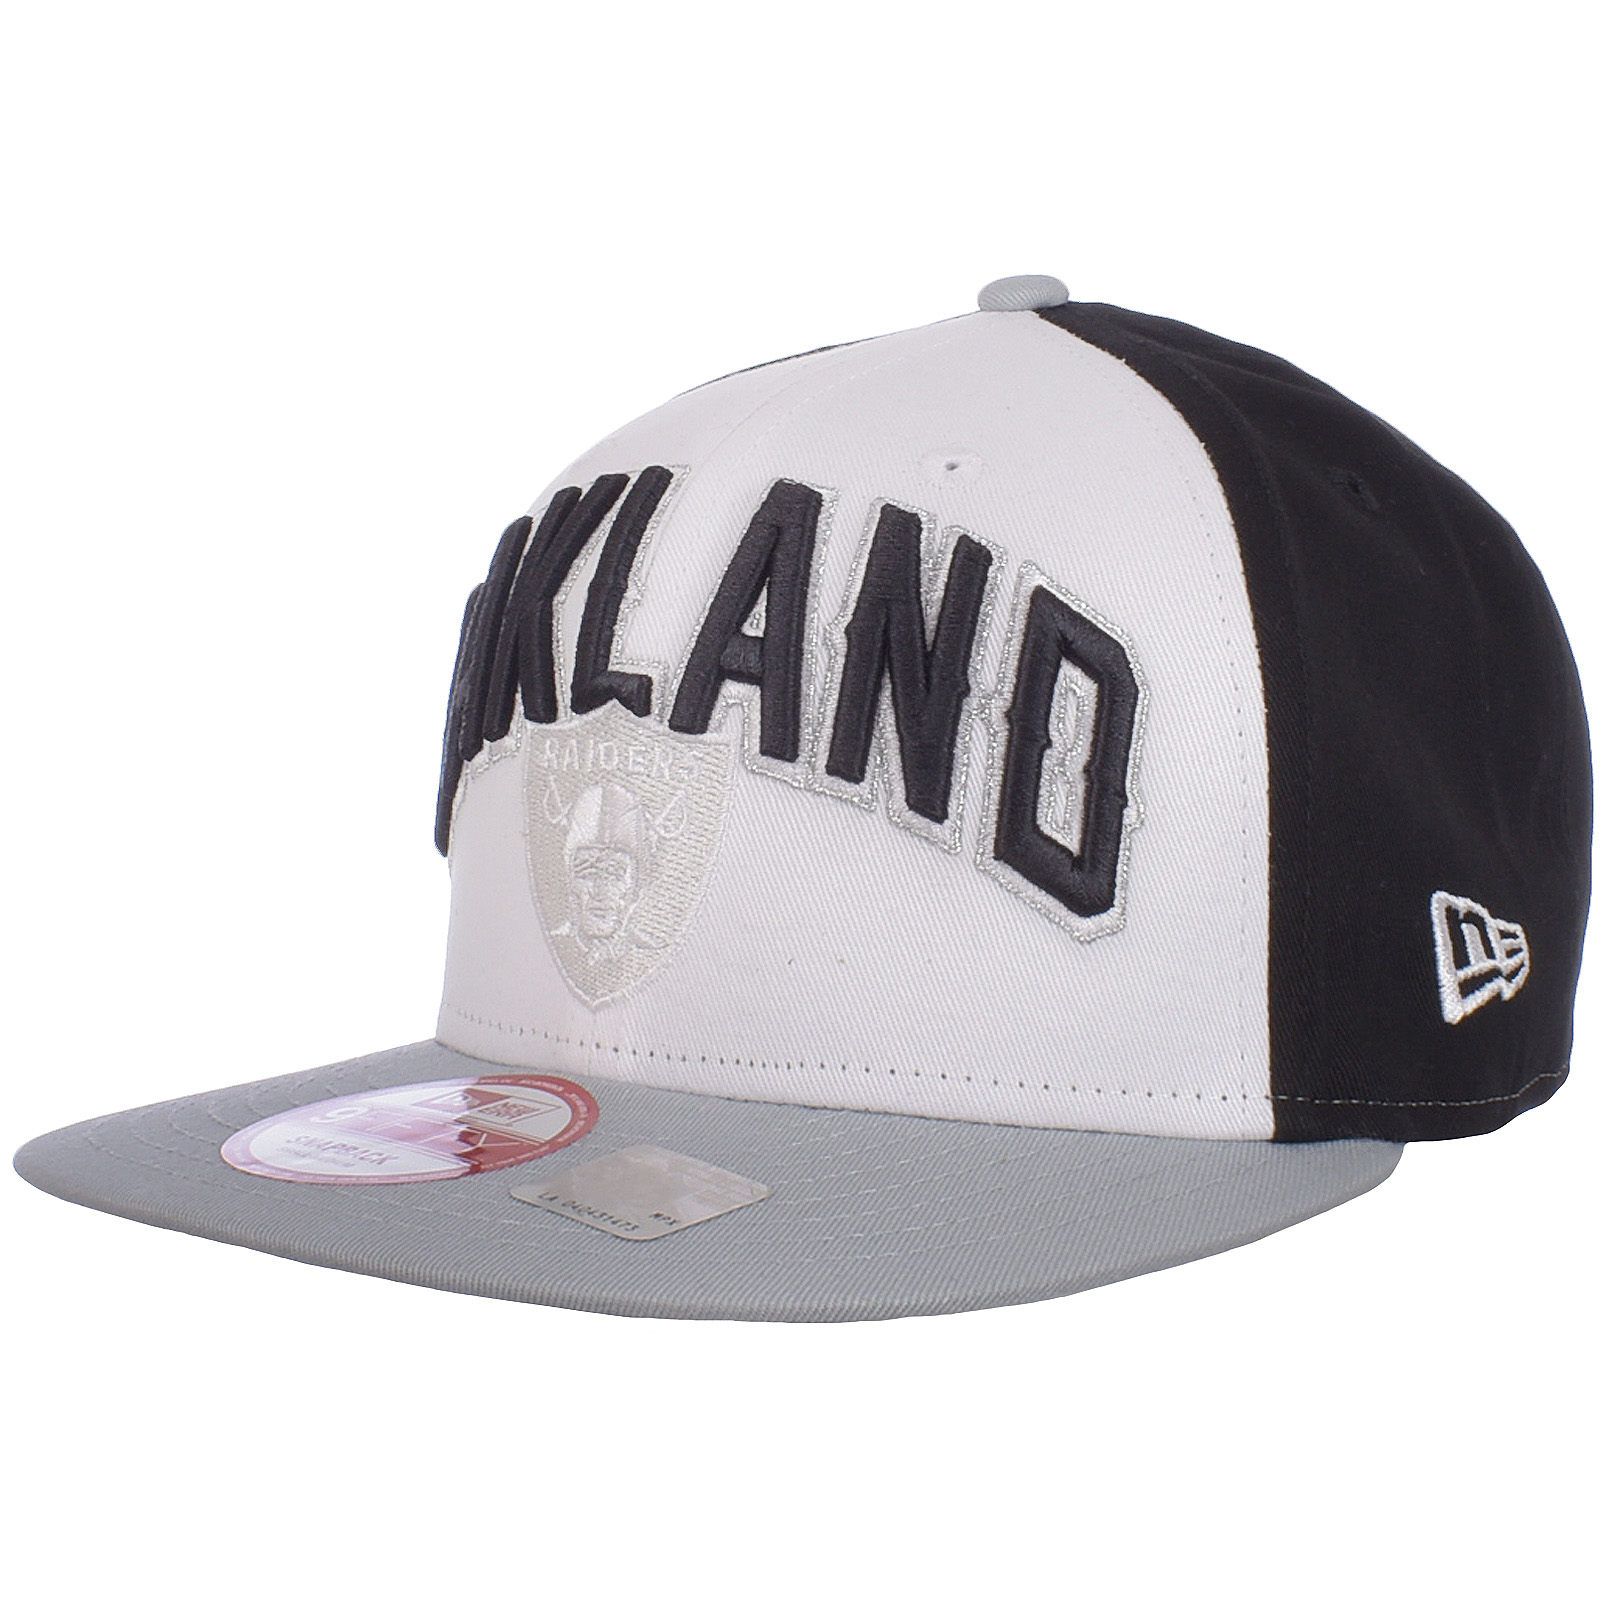 c6e61462 Details about New Era Mens NFL 9FIFTY Snapback Baseball Hat Cap White  Oakland Raiders S/M